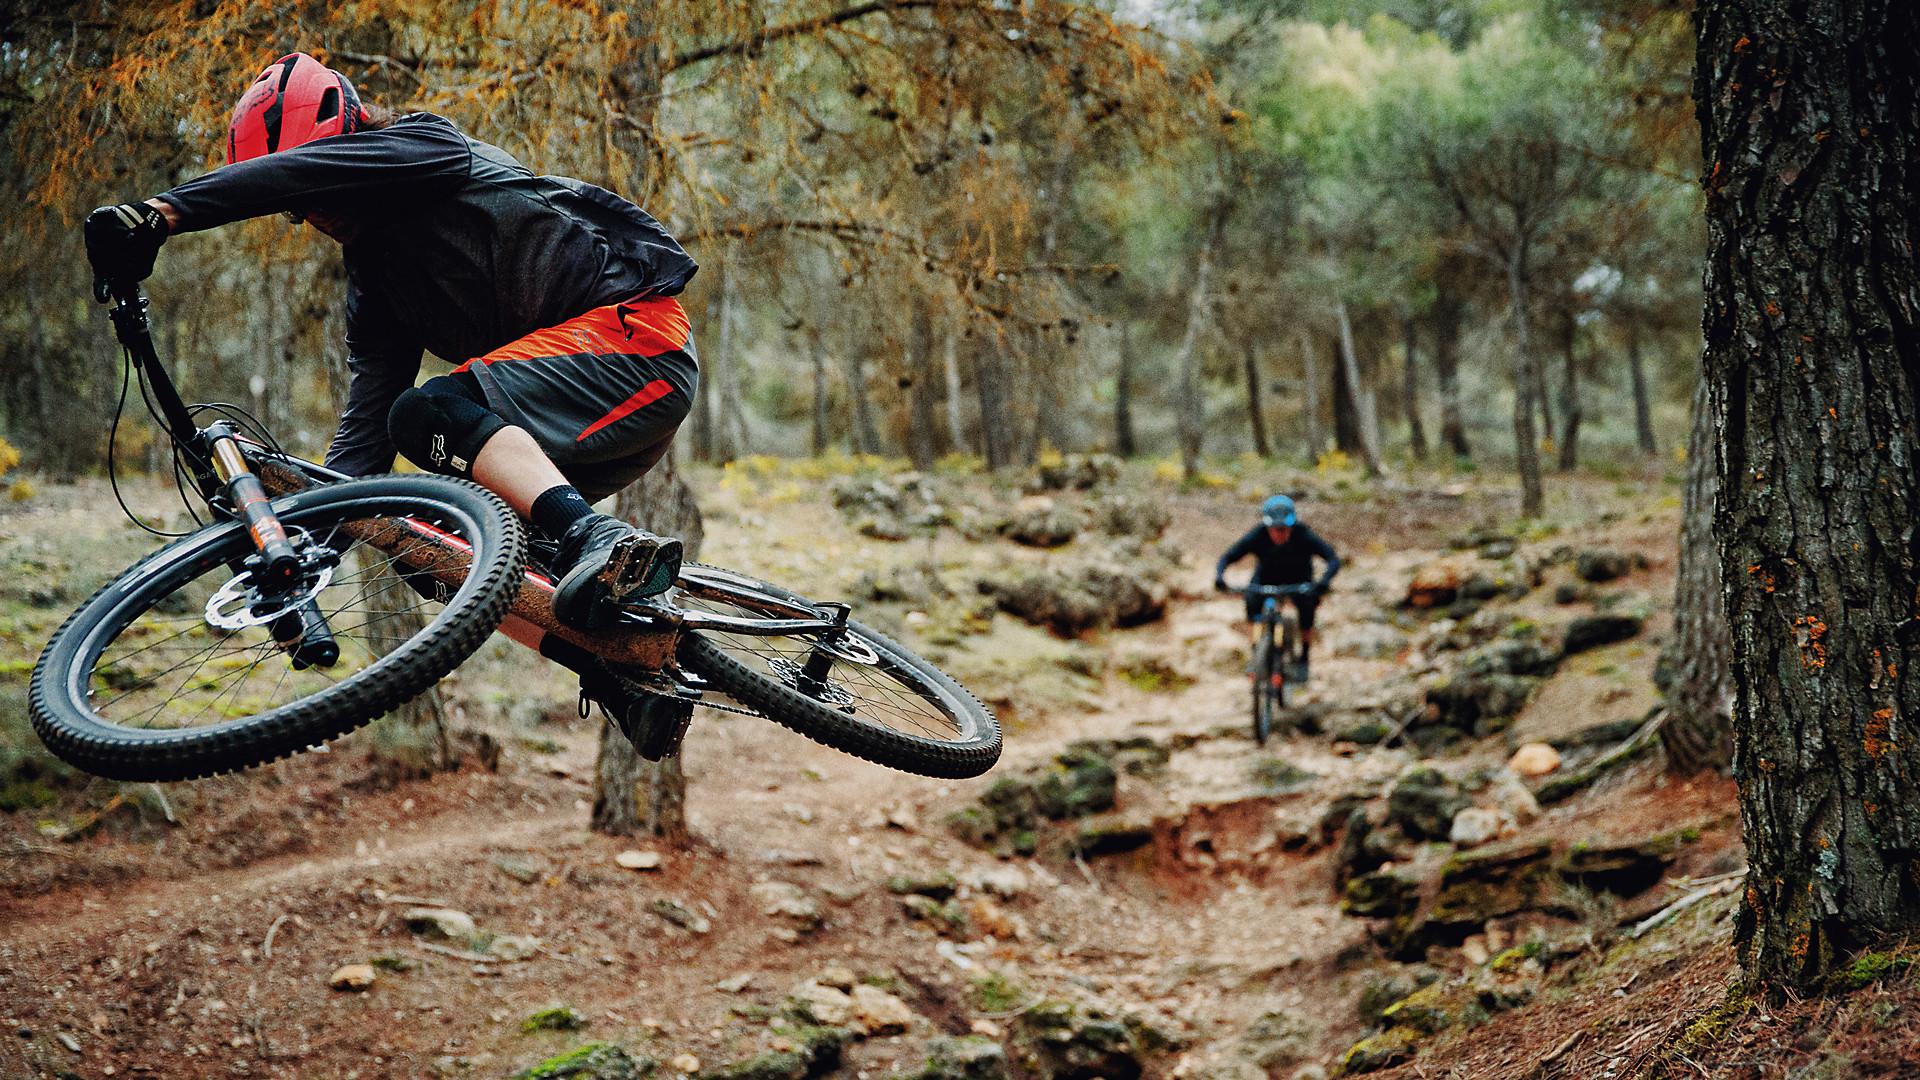 What mountain bike wheel size is right for me? | Trek Bikes